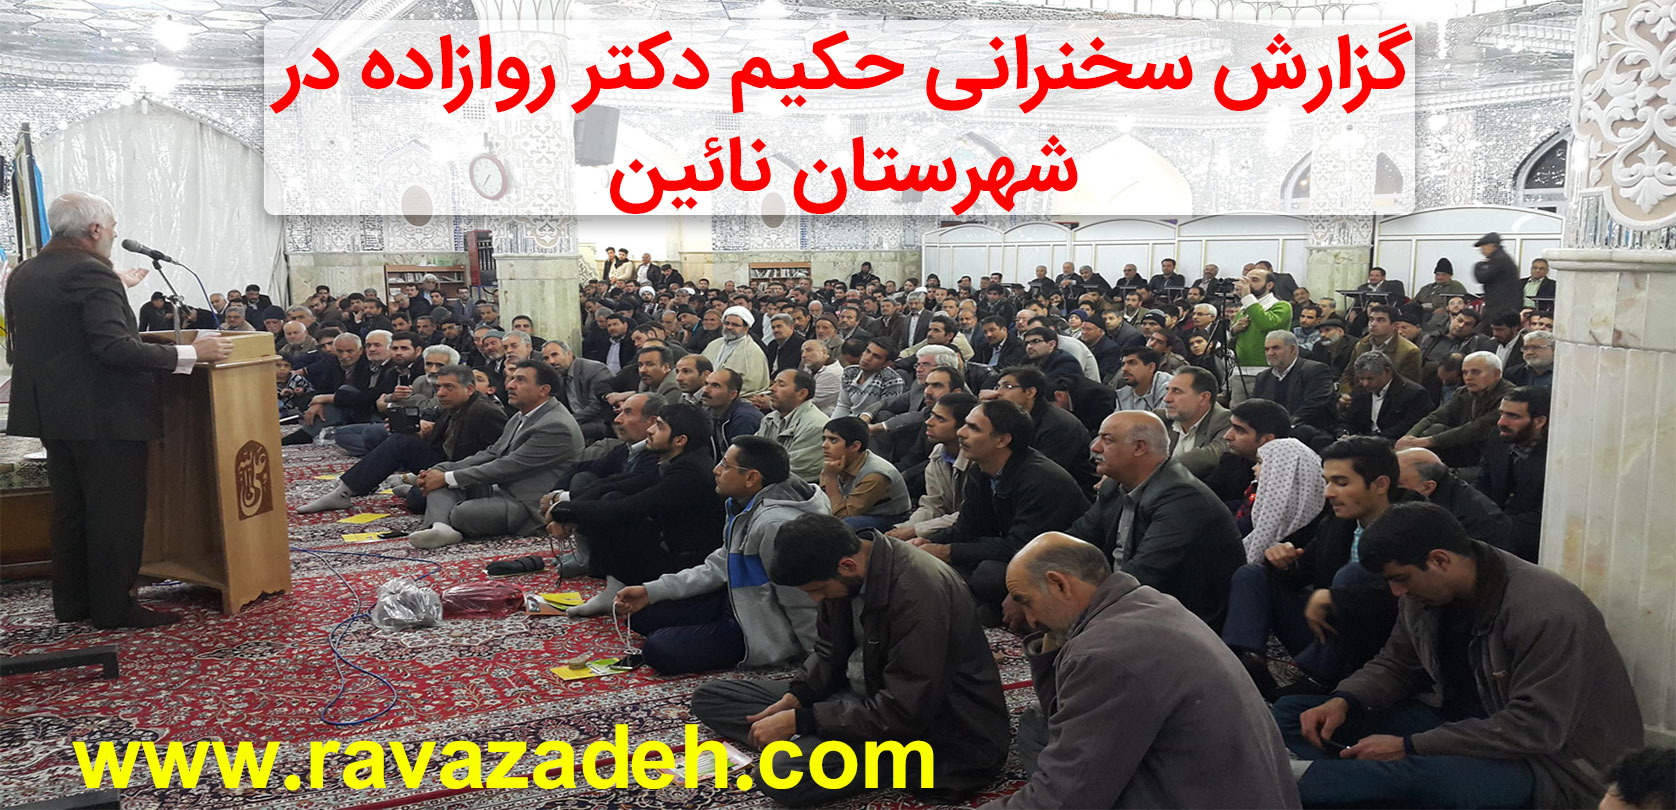 Photo of گزارش سخنرانی حکیم دکتر روازاده در شهرستان نائین + تصاویر